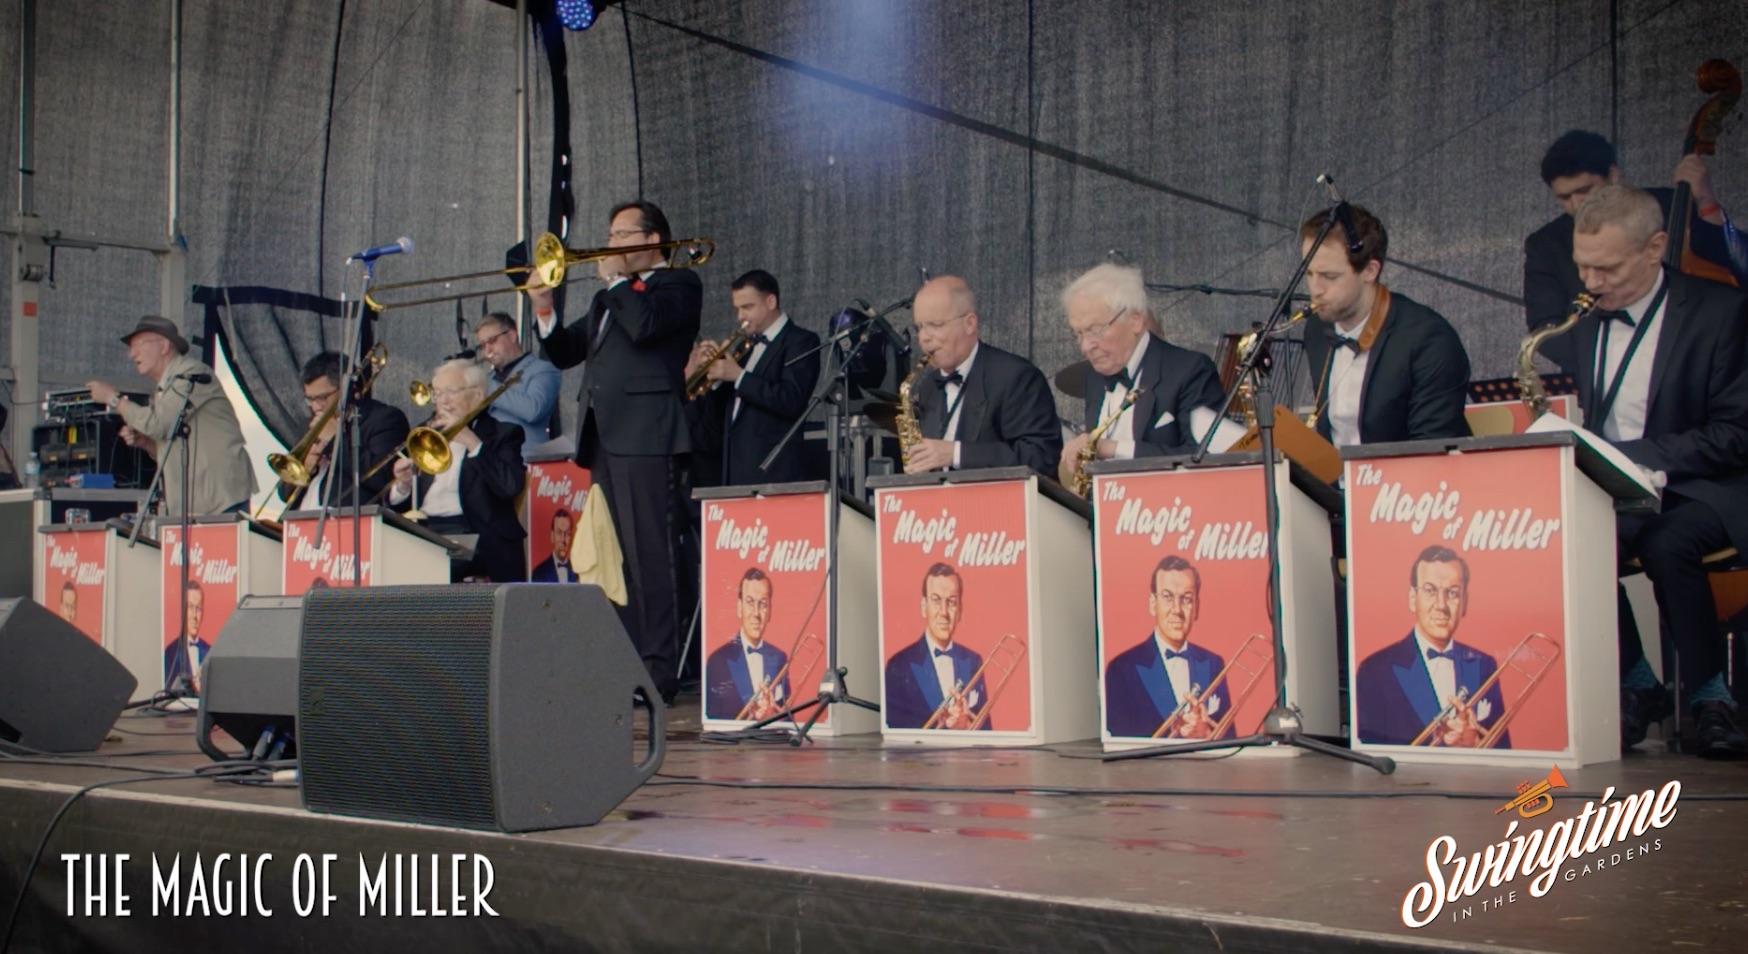 The Magic of Miller